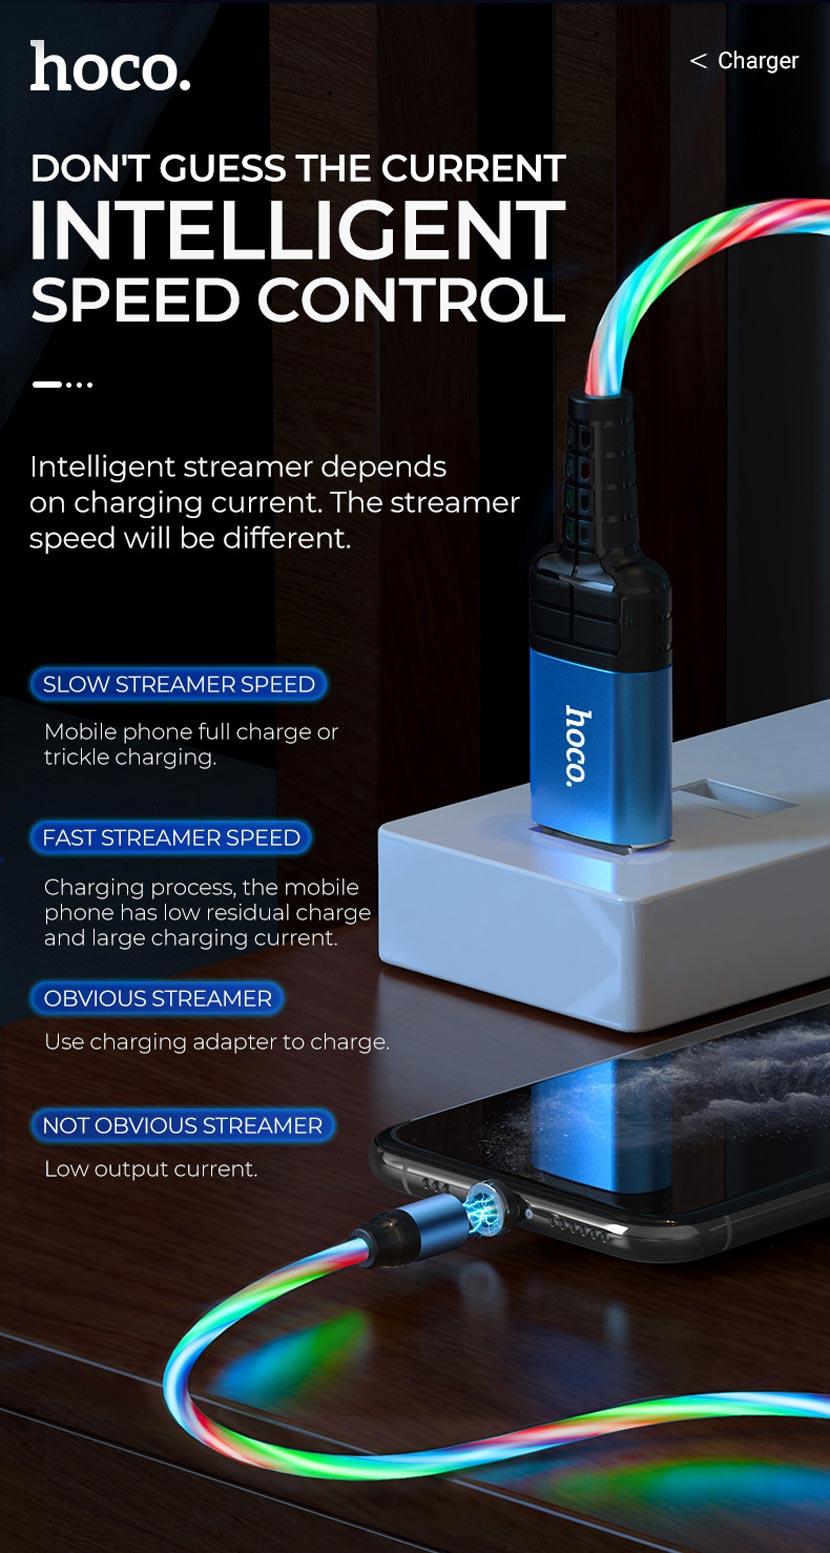 hoco news u90 ingenious streamer charging cable speed control en